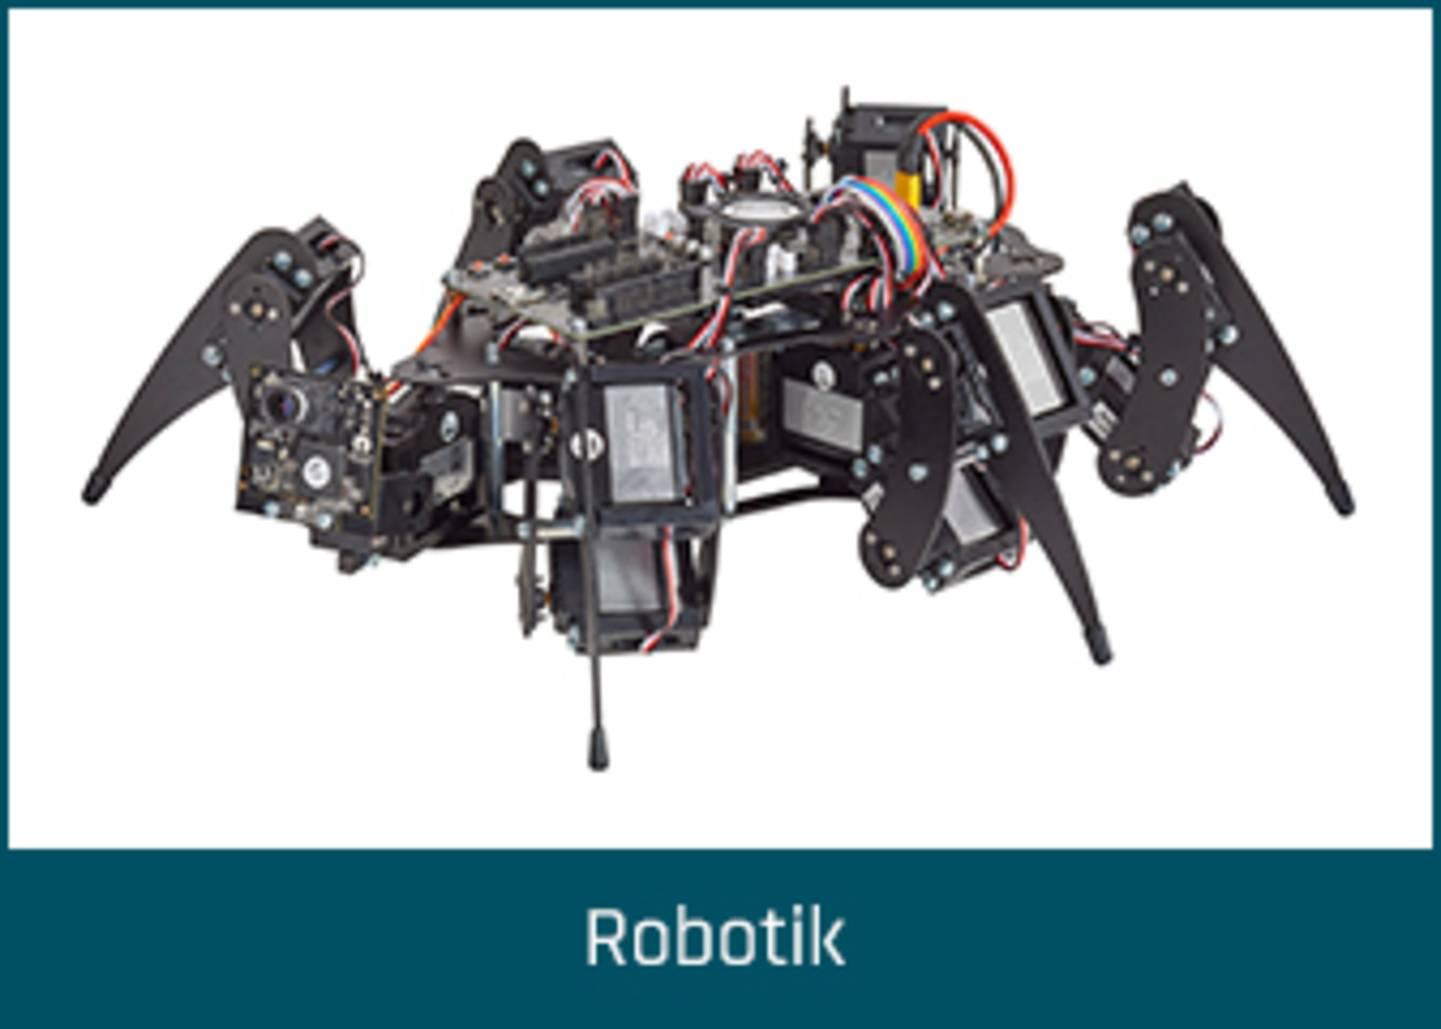 MAKERFACTORY Robotik